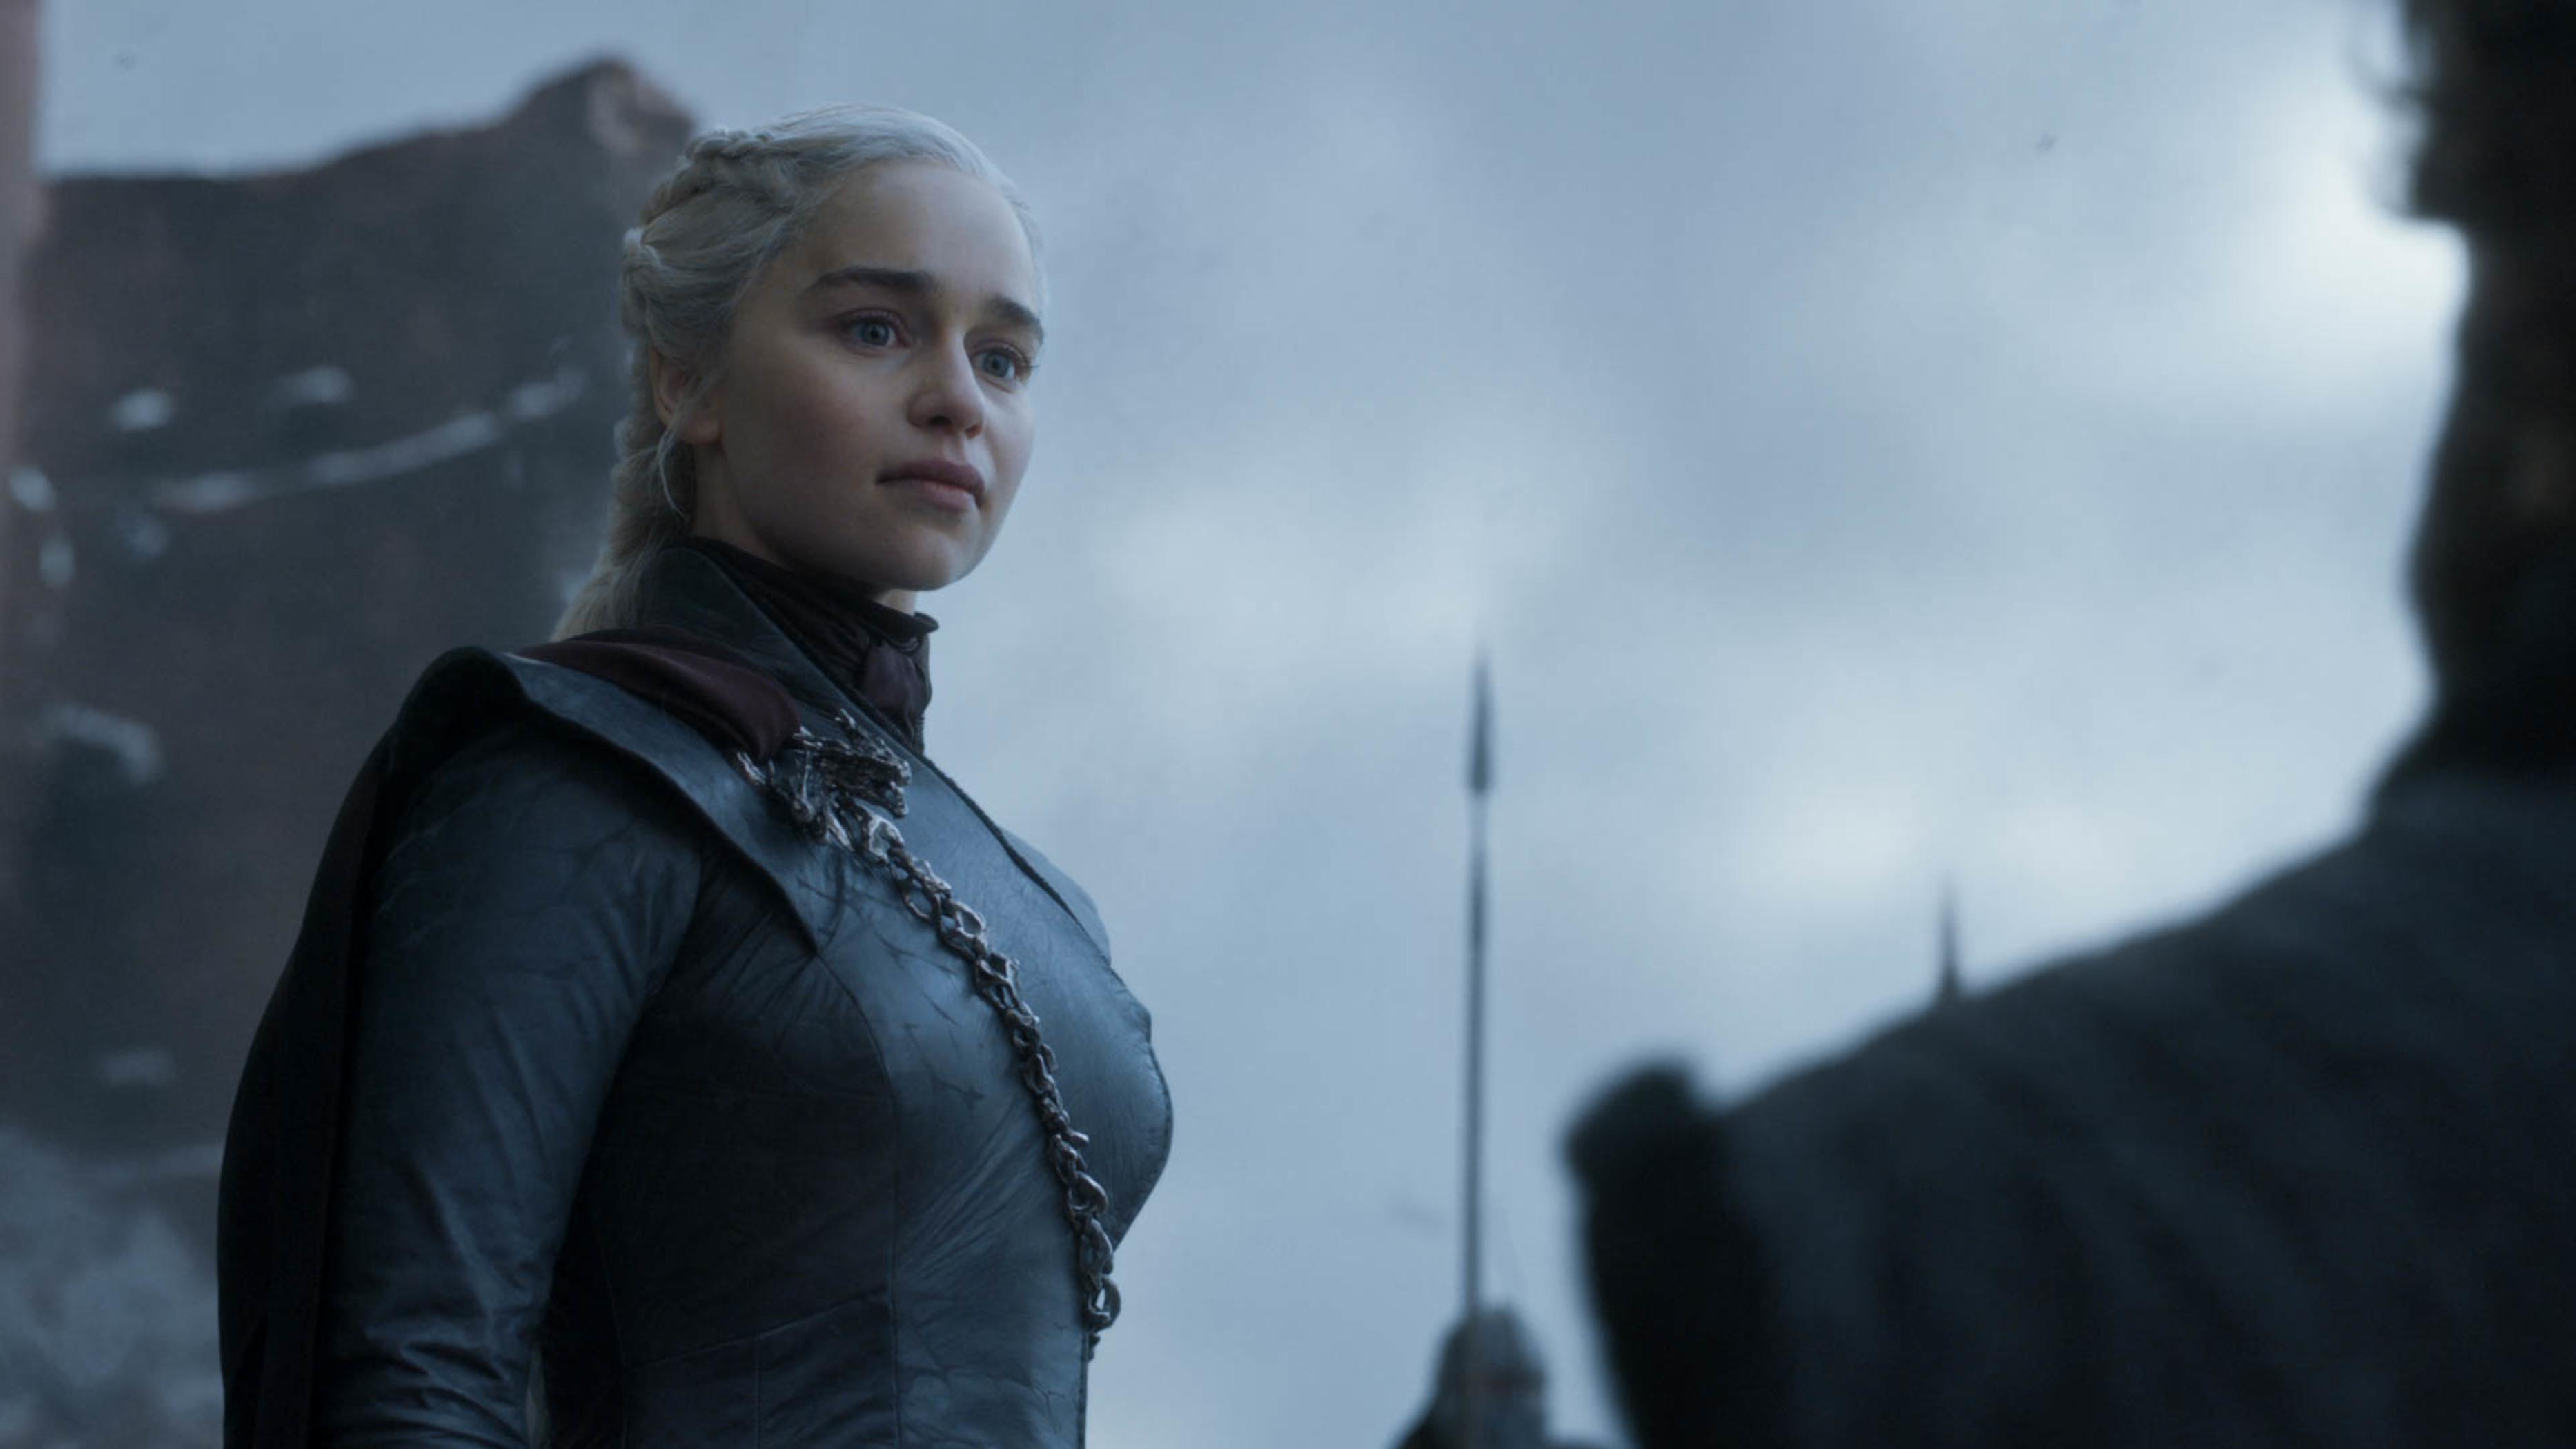 Game Of Game Of Thrones Season 8 Episode 6 The Iron Throne The